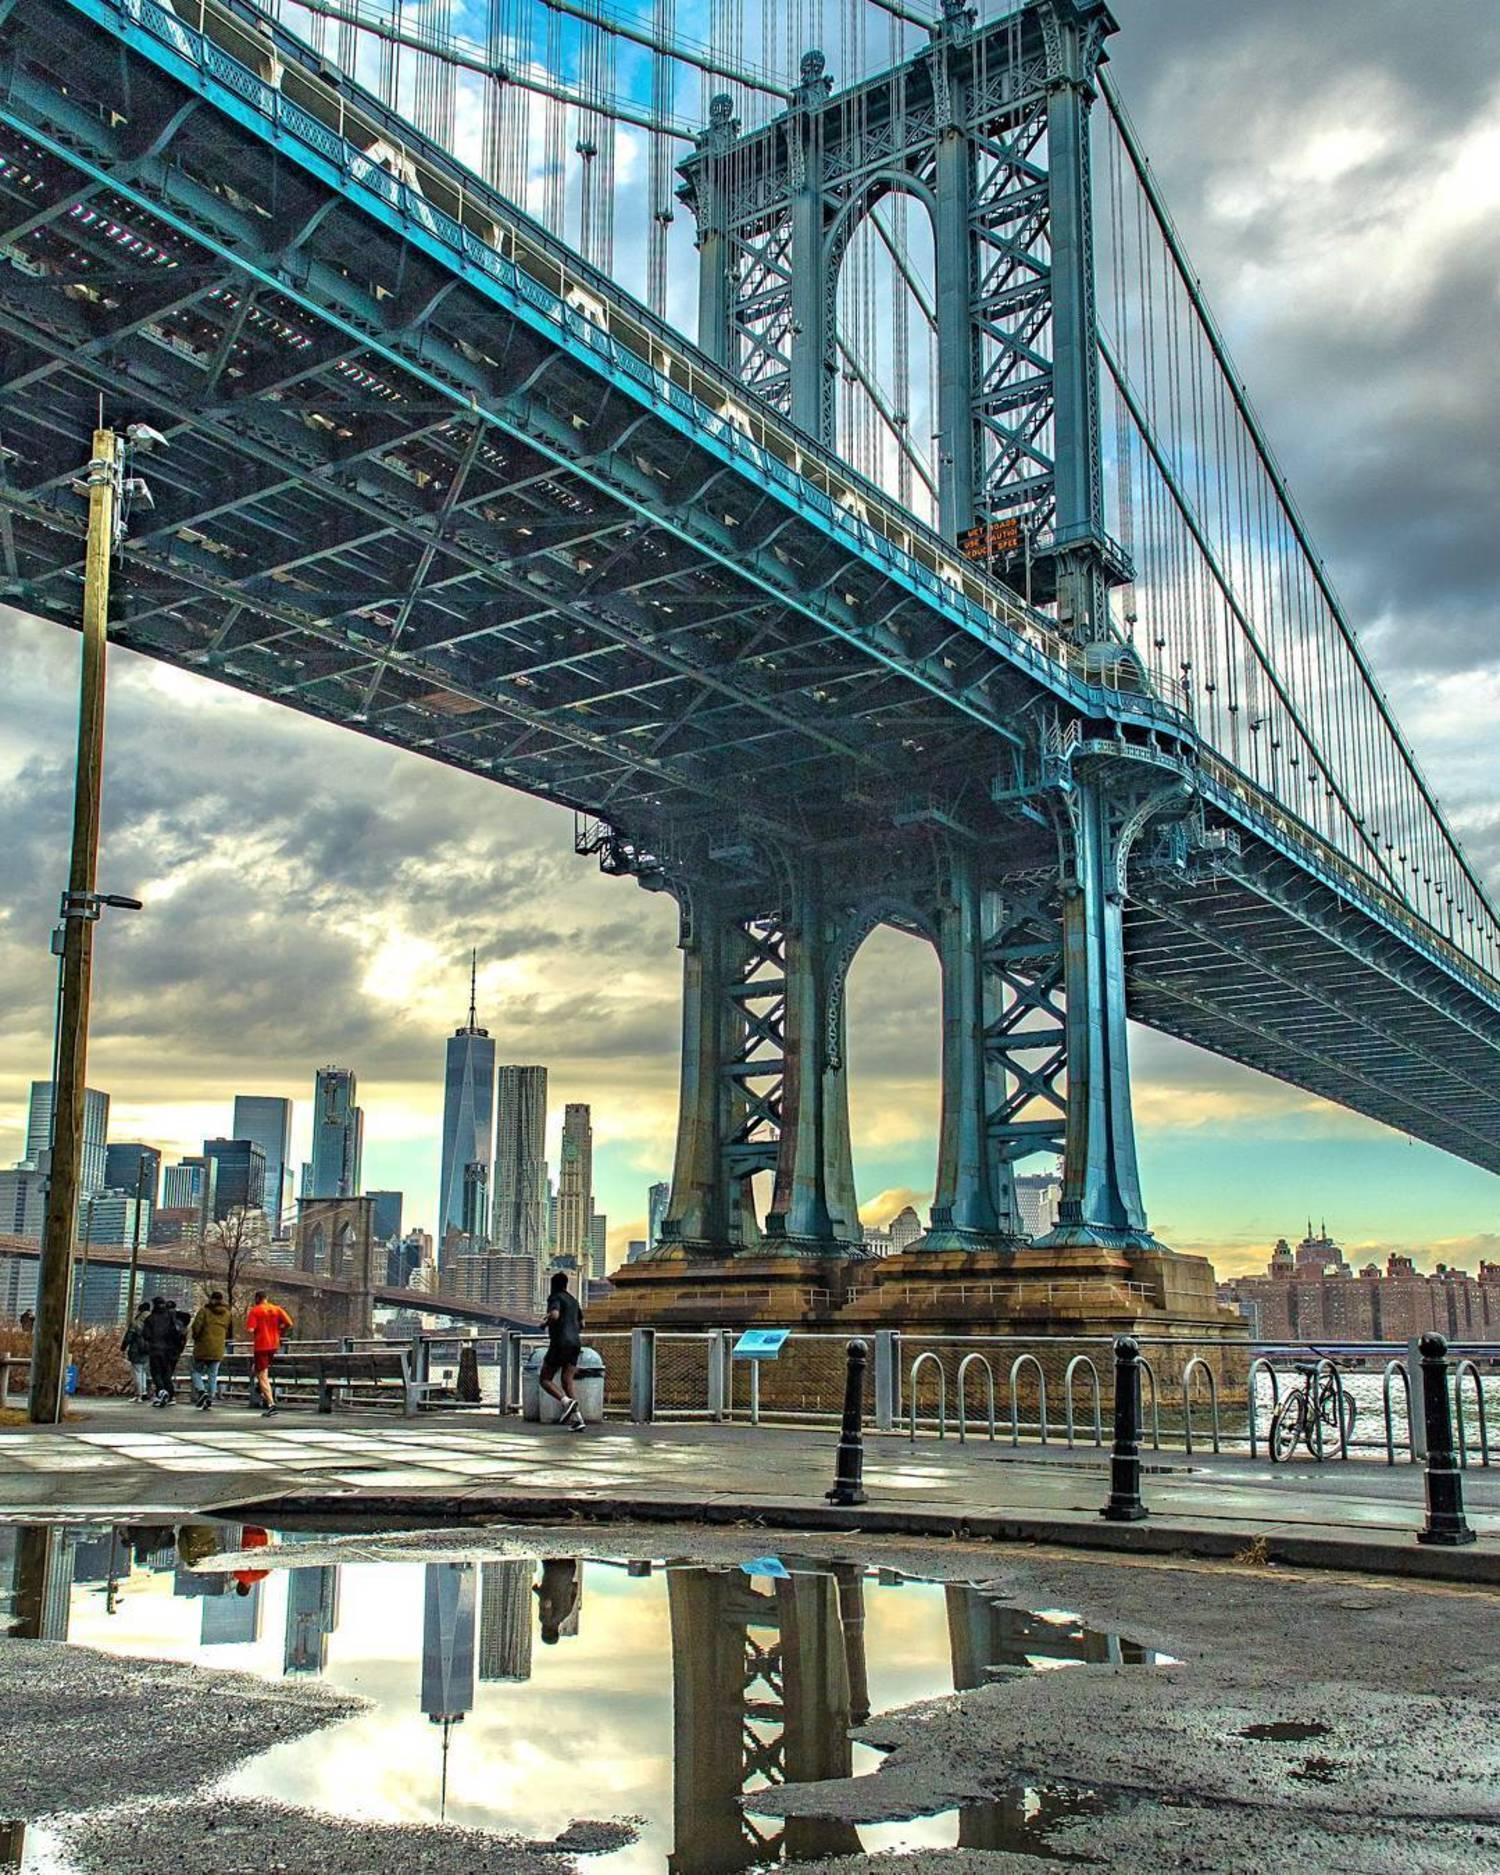 Manhattan Bridge, DUMBO, Brooklyn, New York